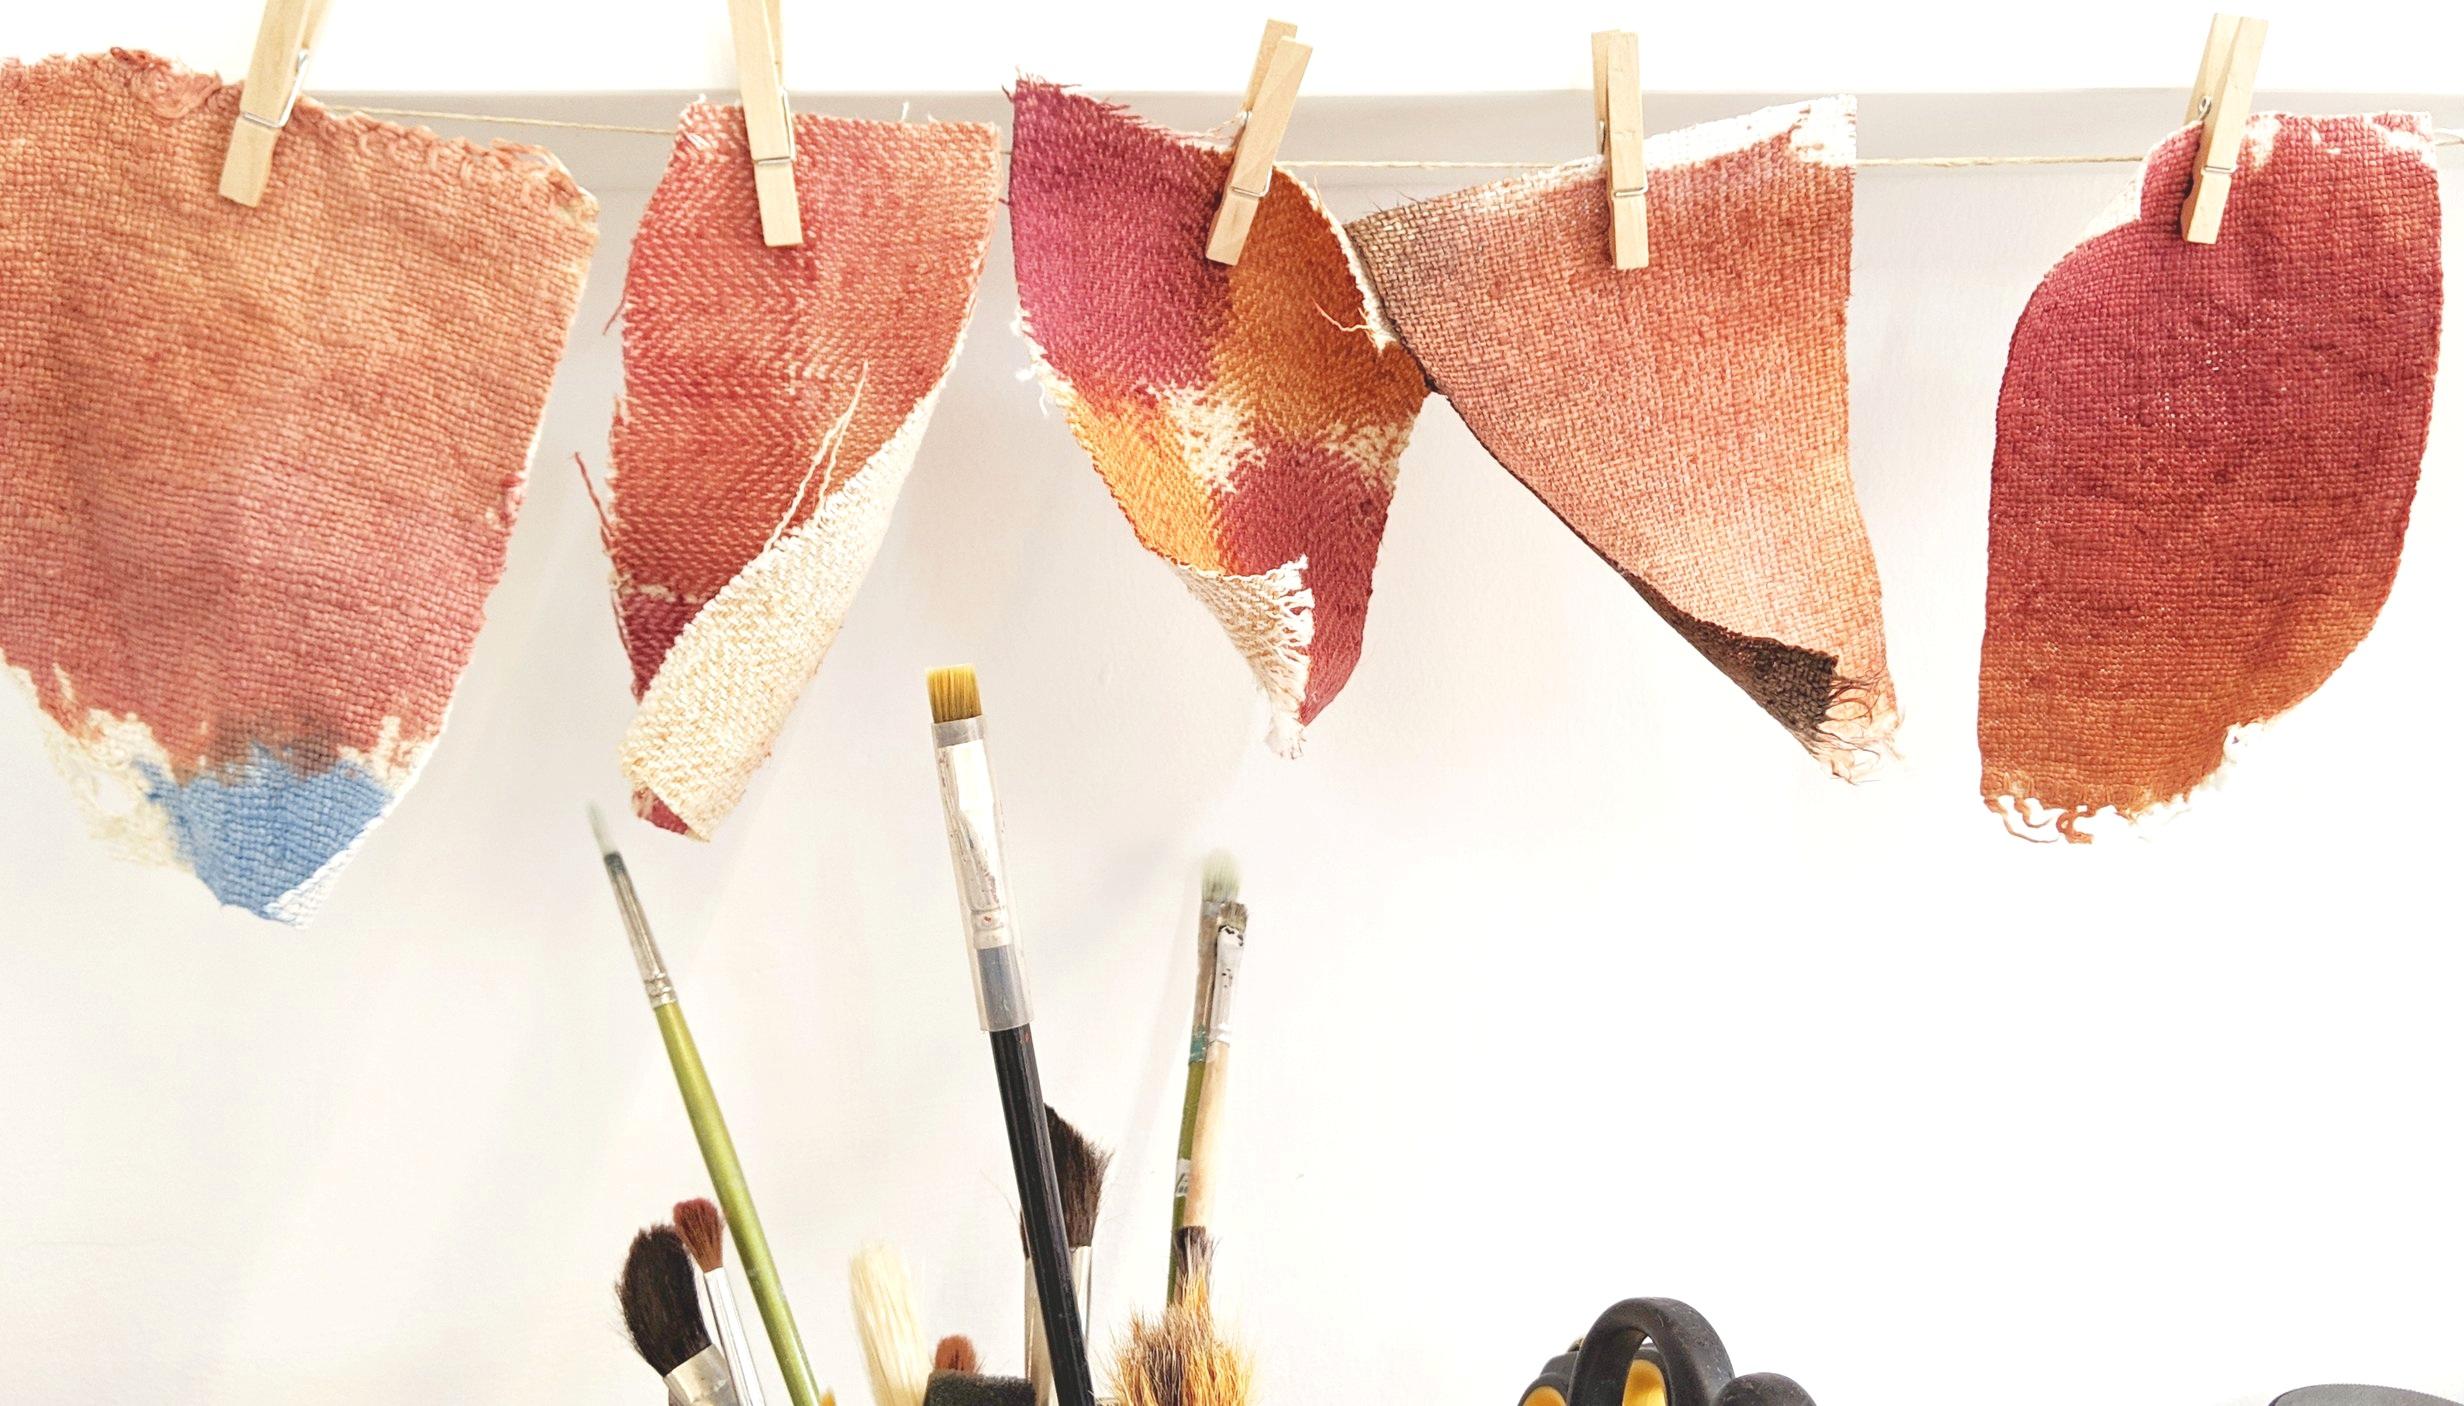 espanyolet_hand_painted_design_color_texture.jpg